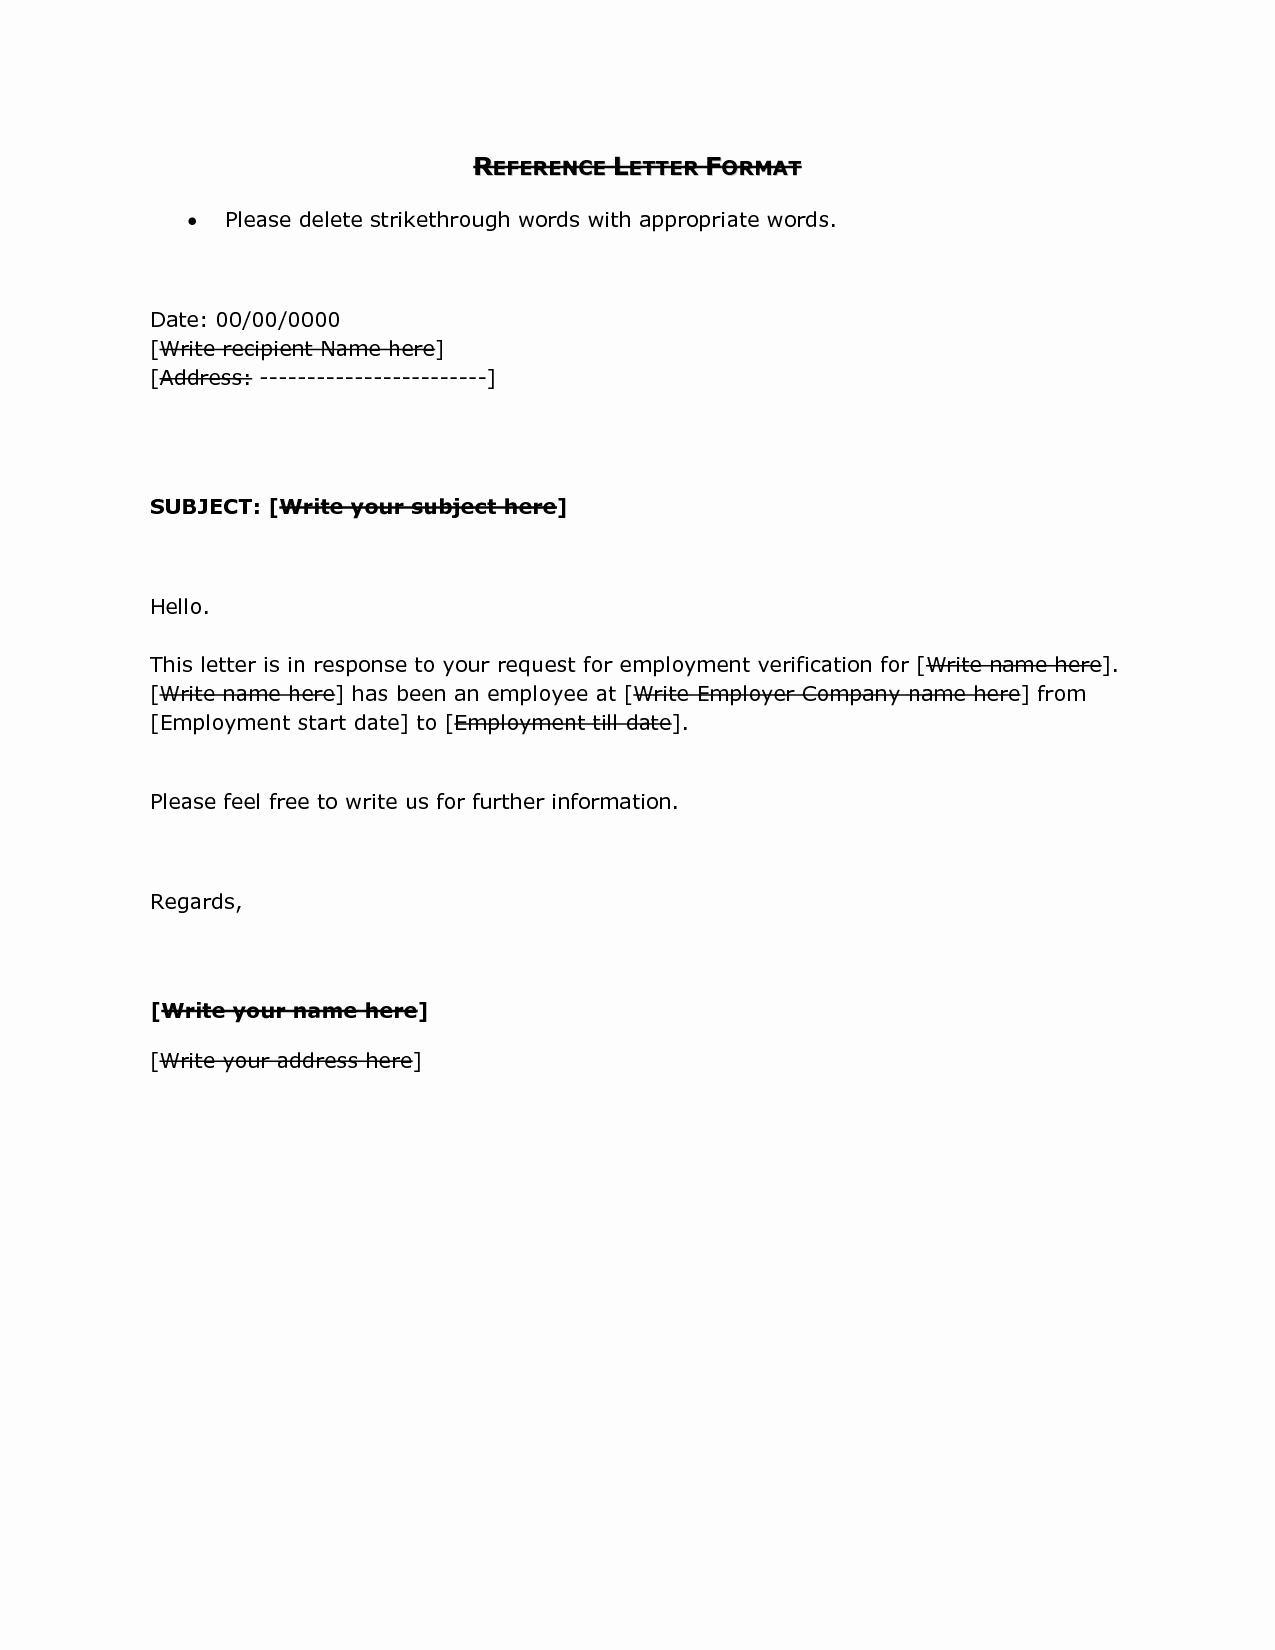 Simple Recommendation Letter for Employment Best Of Reference Letter Sample Employment Portablegasgrillweber